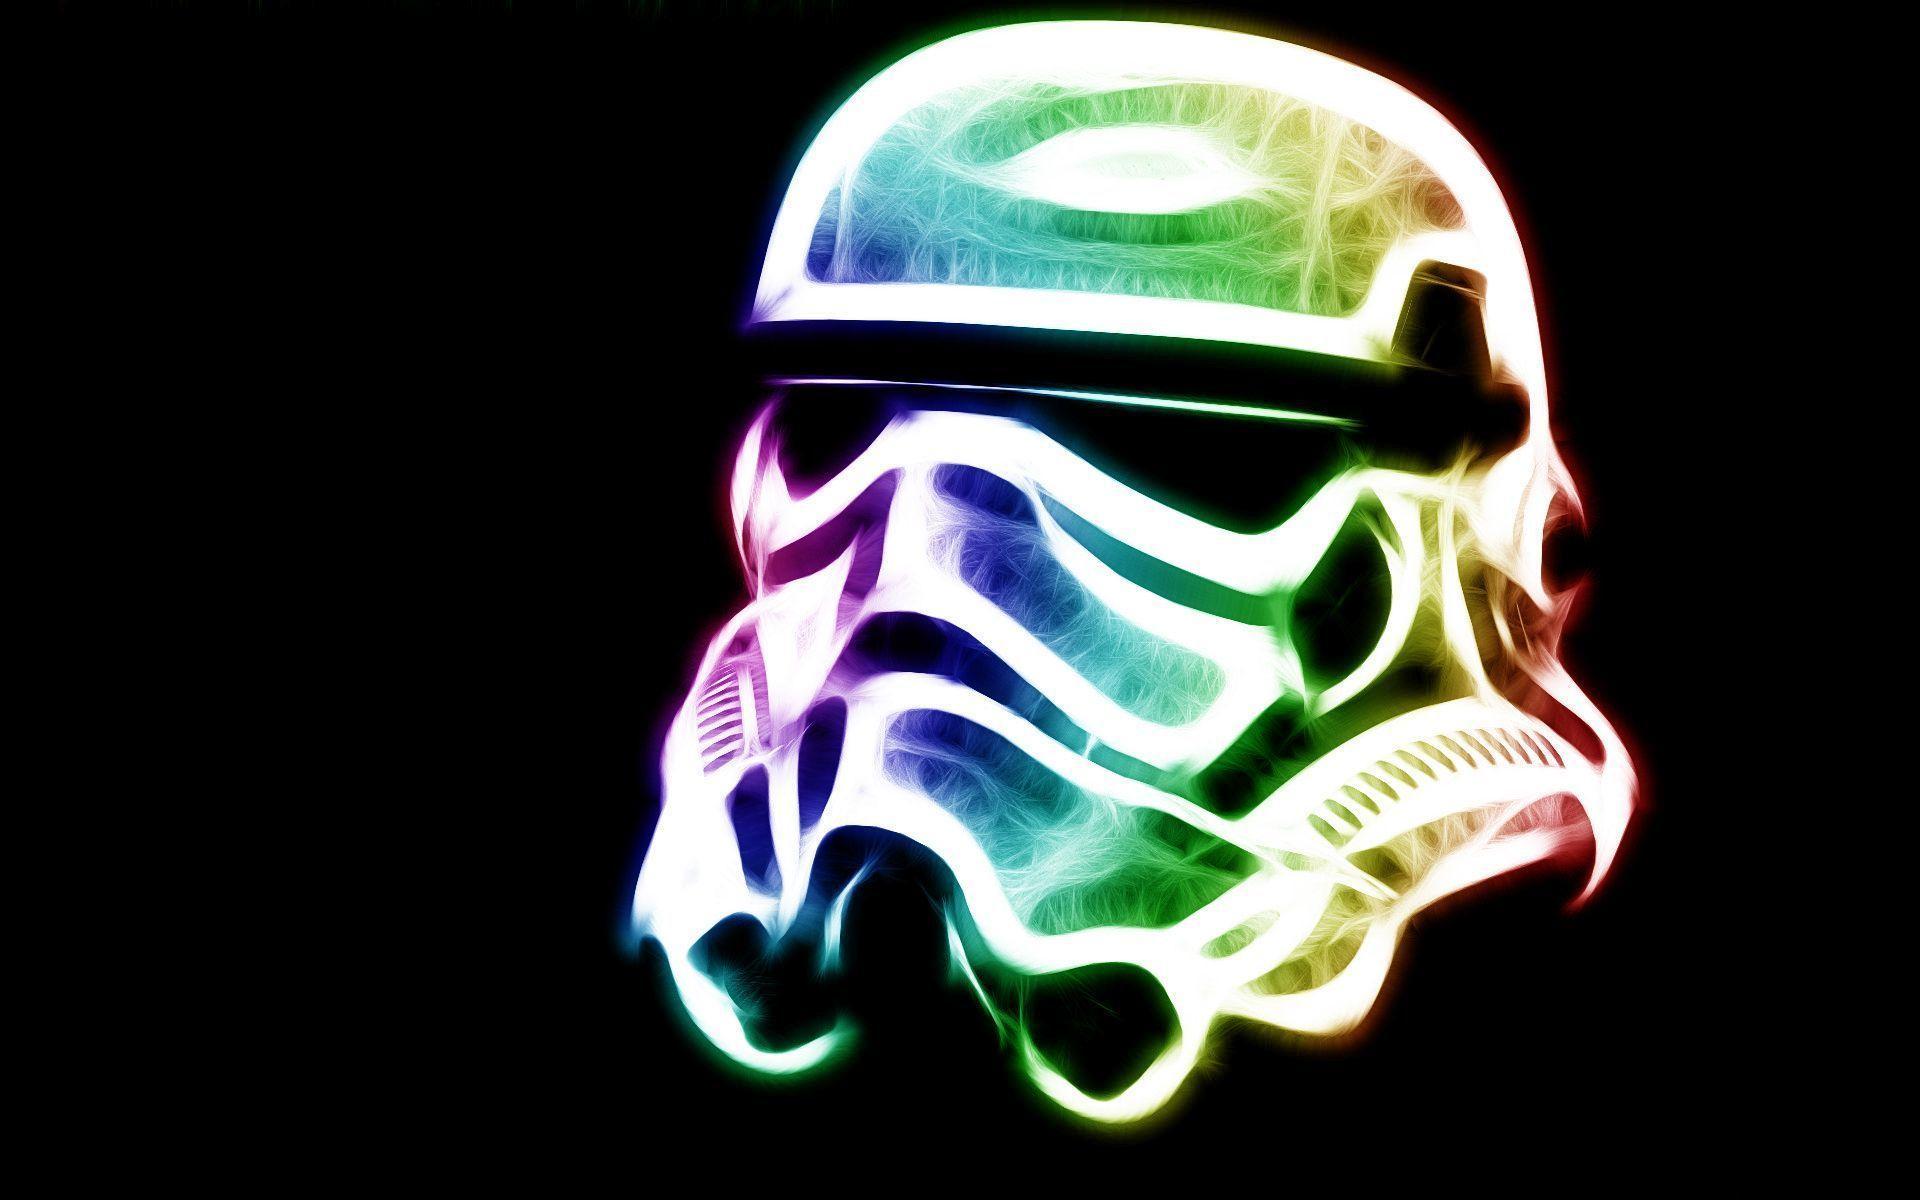 Star Wars Stormtrooper Wallpapers - Wallpaper Cave